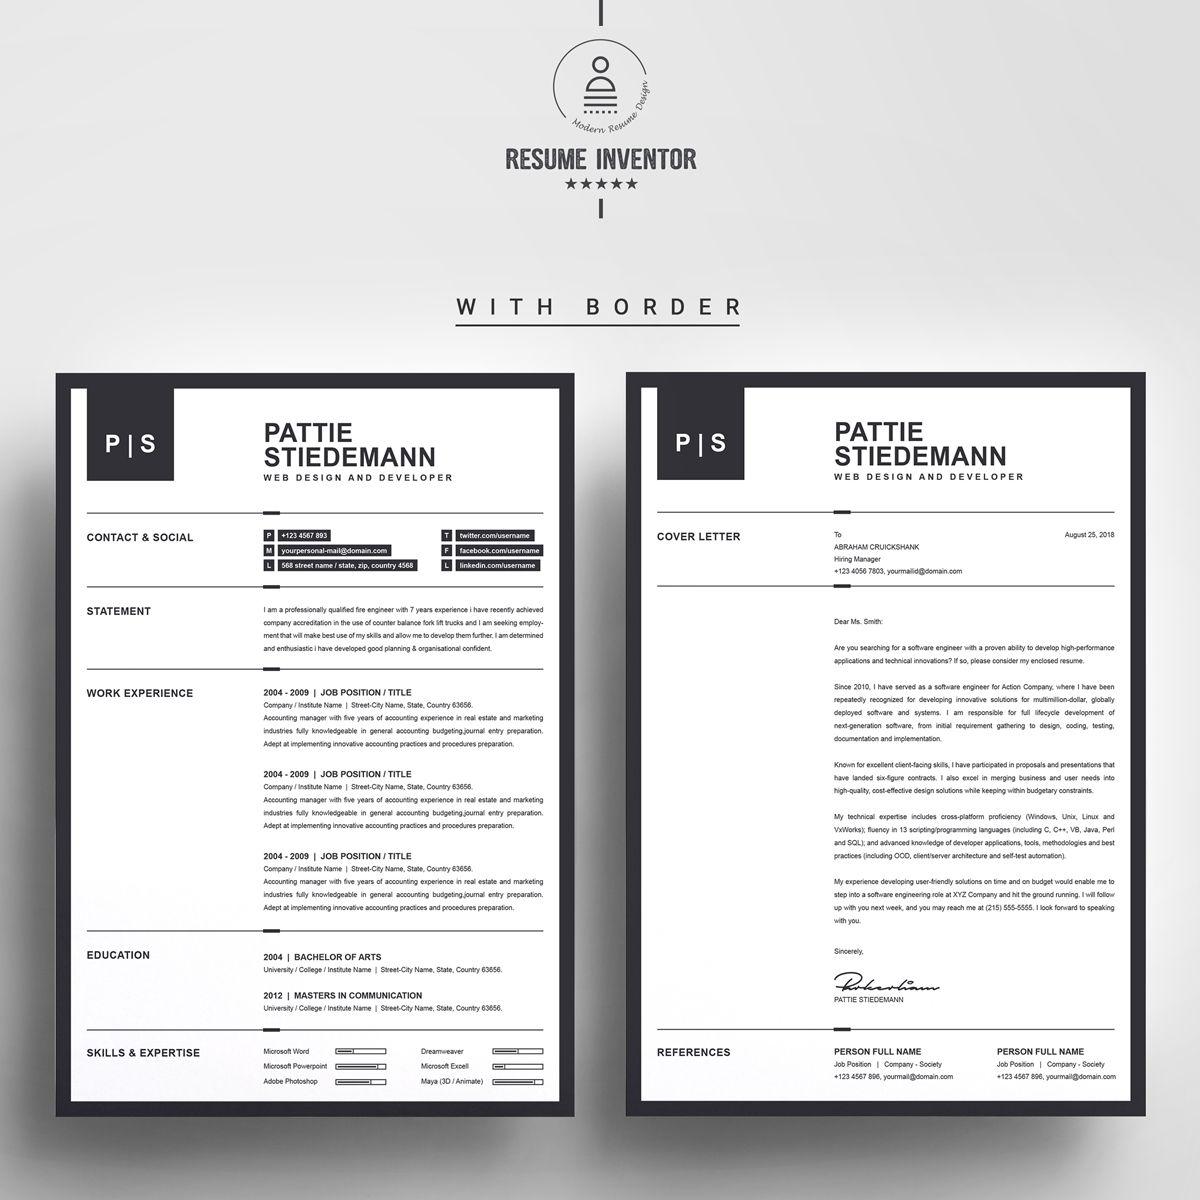 Pattie Stiedeman Resume Template 76936 Resume template